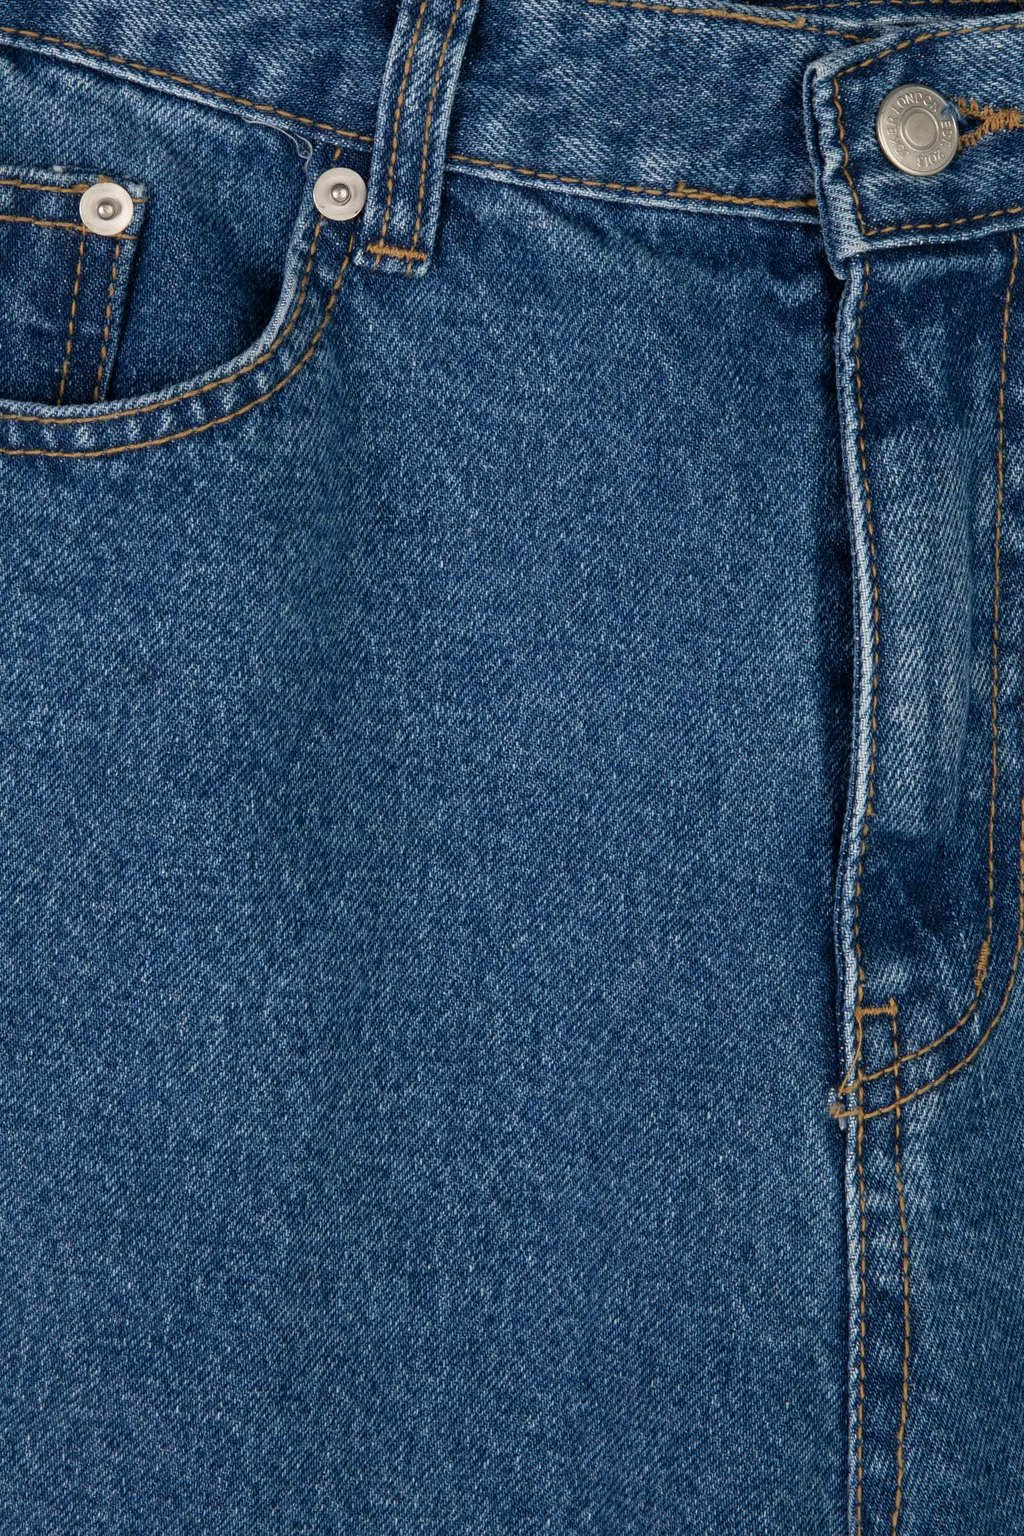 Short K002M Blue 8